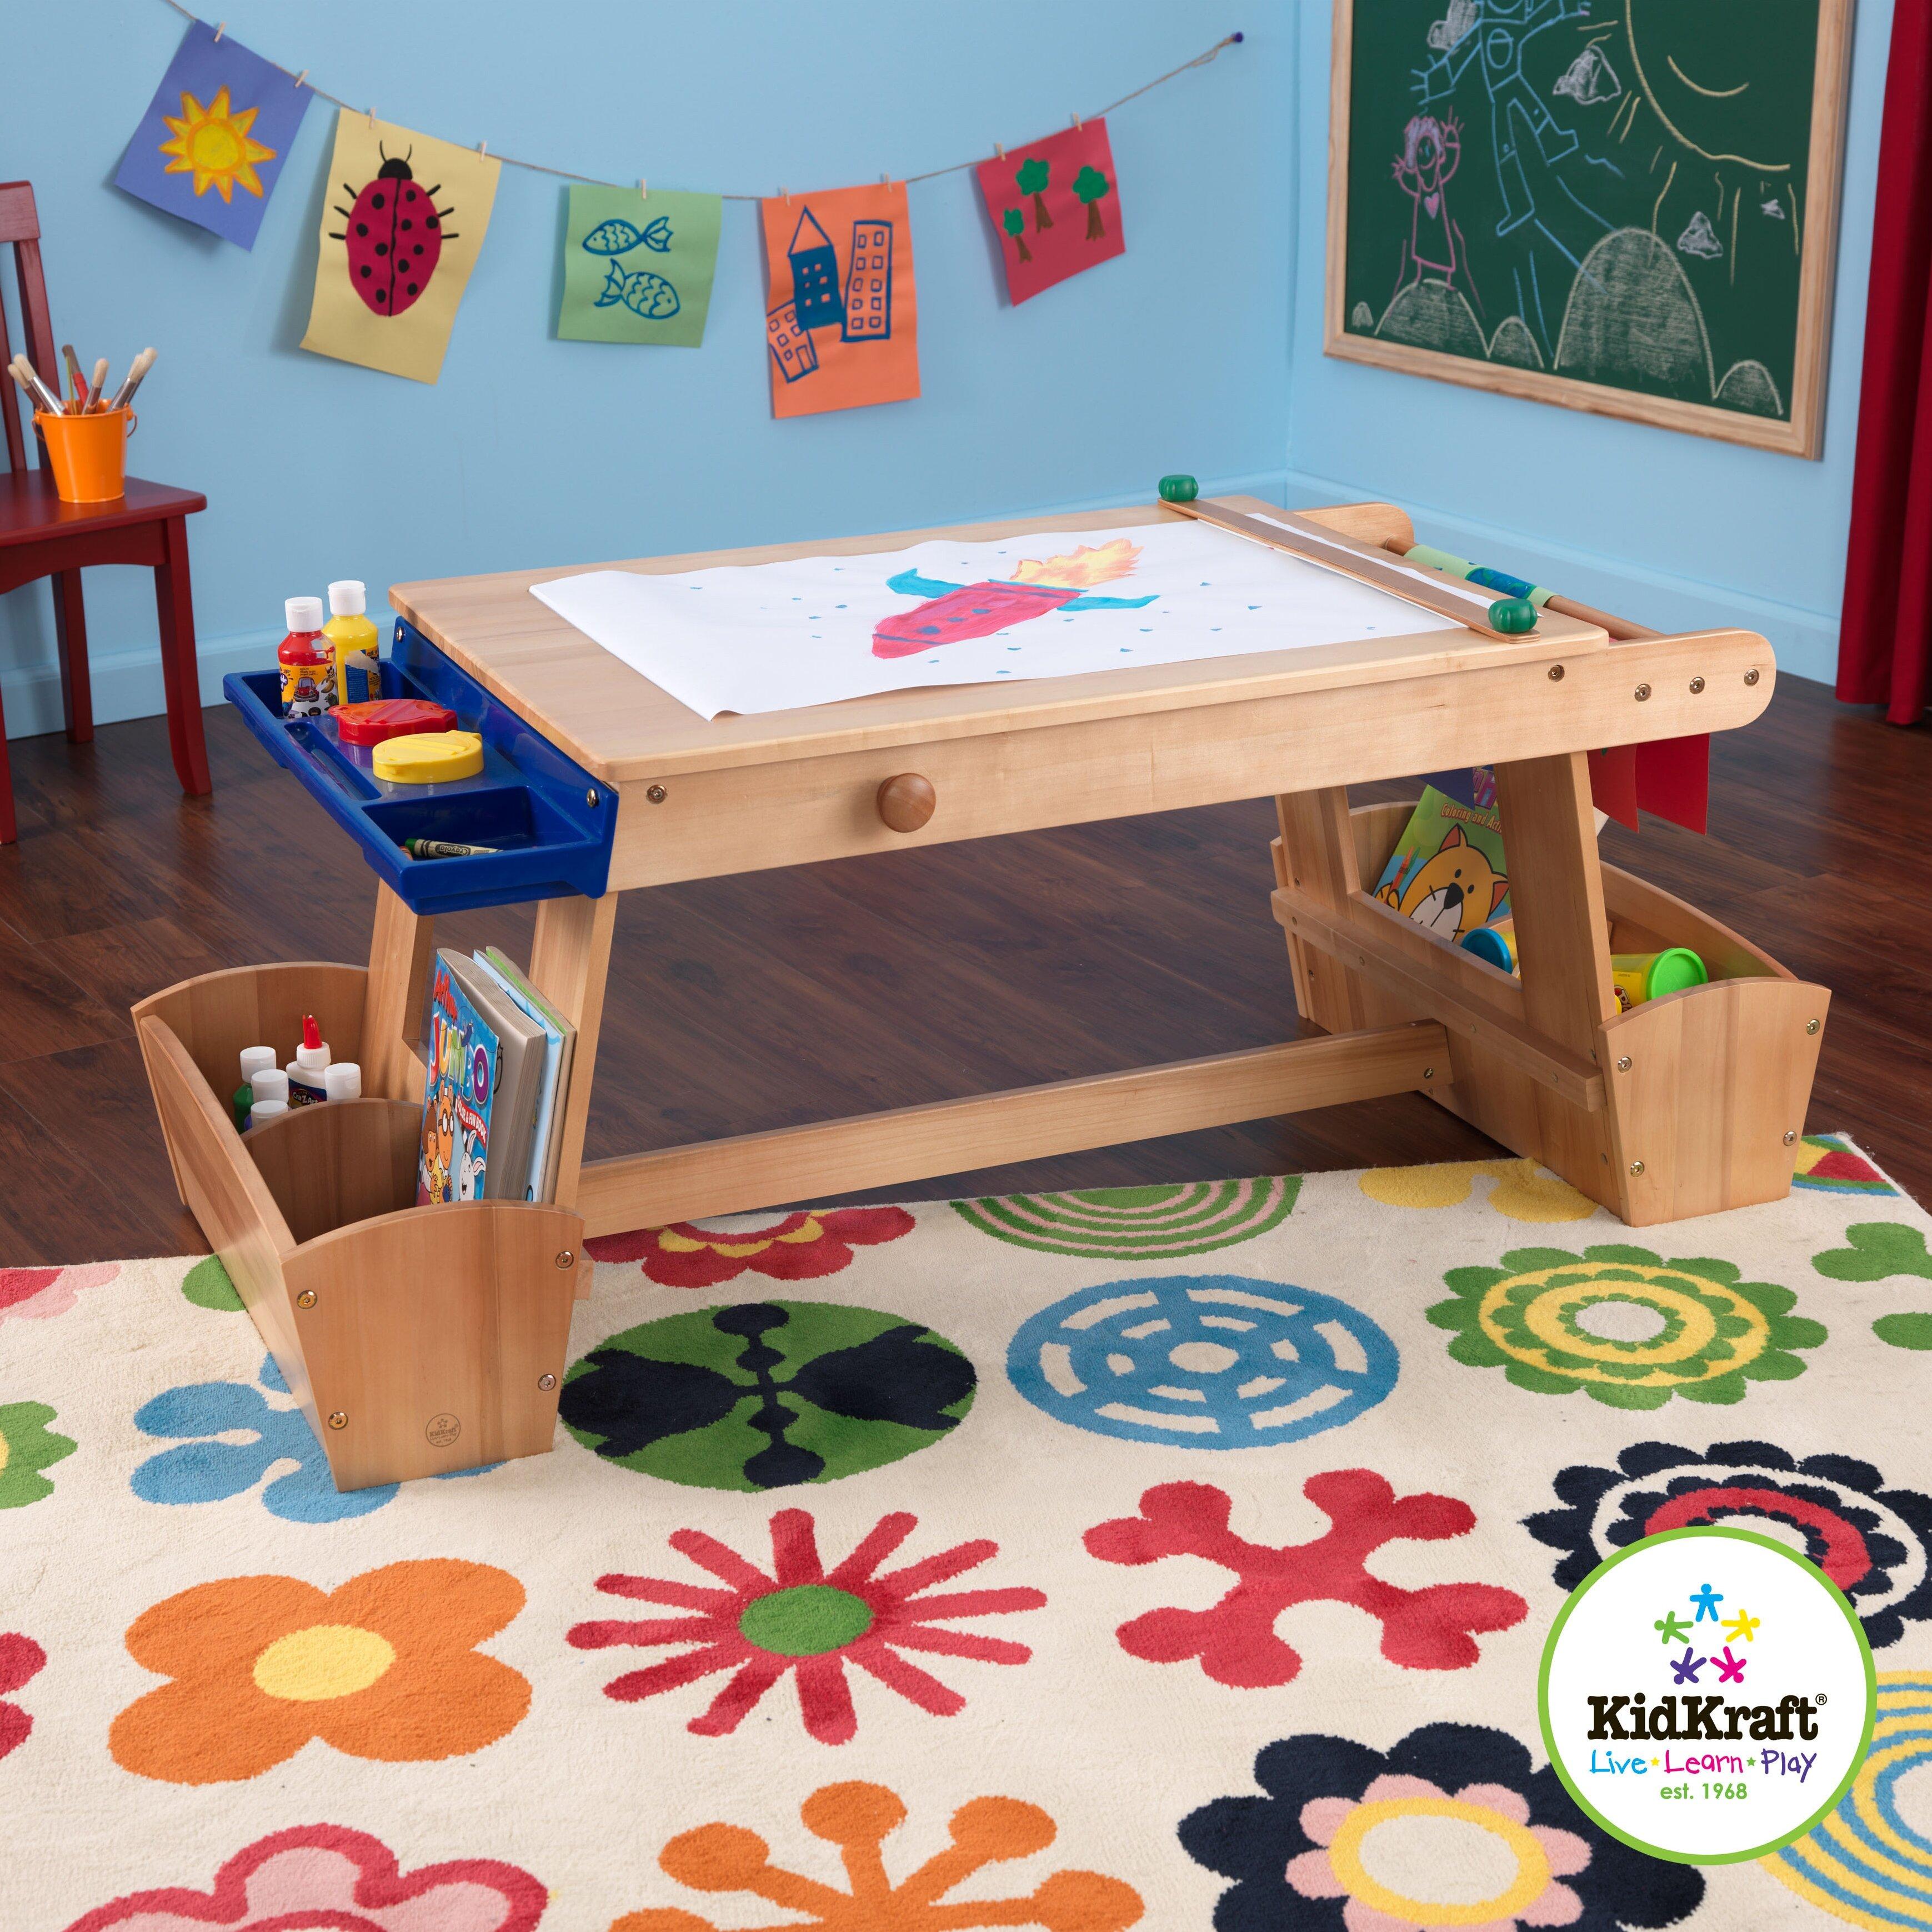 kidkraft drying rack and storage kids arts and crafts. Black Bedroom Furniture Sets. Home Design Ideas